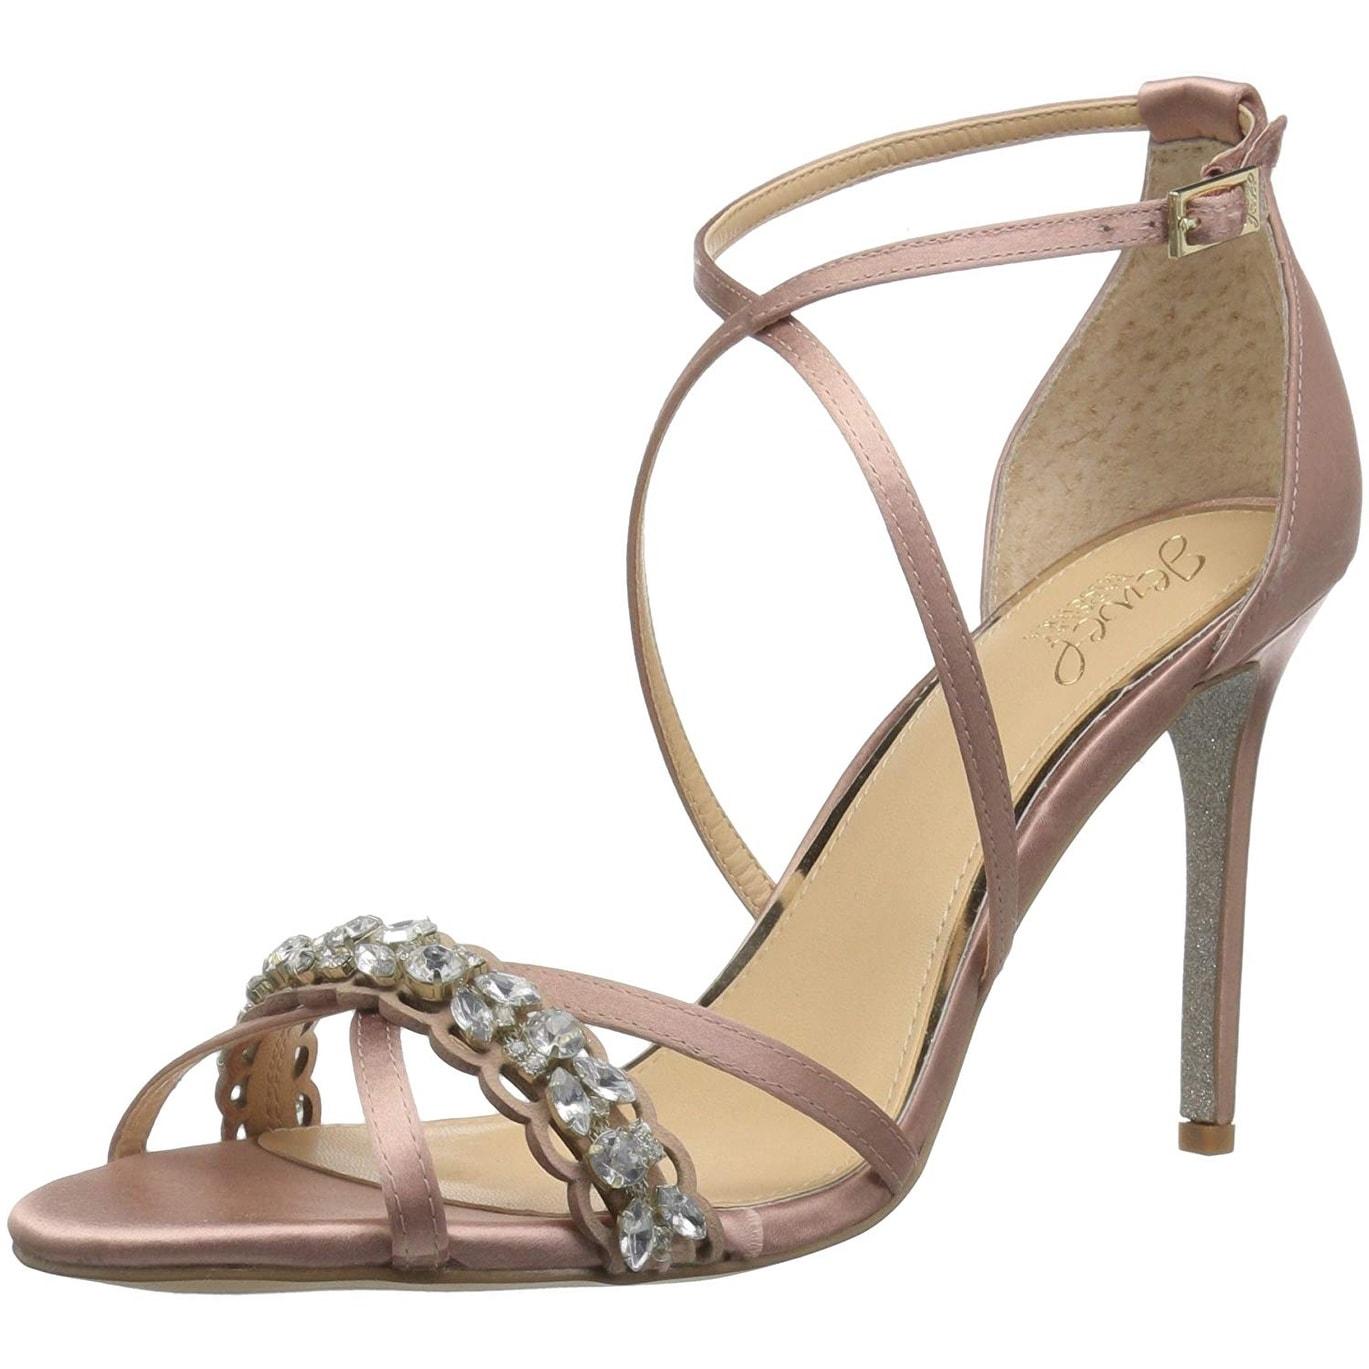 1a8f5c5d92bd Shop Badgley Mischka Women s Gisele Heeled Sandal - 10 - Free ...